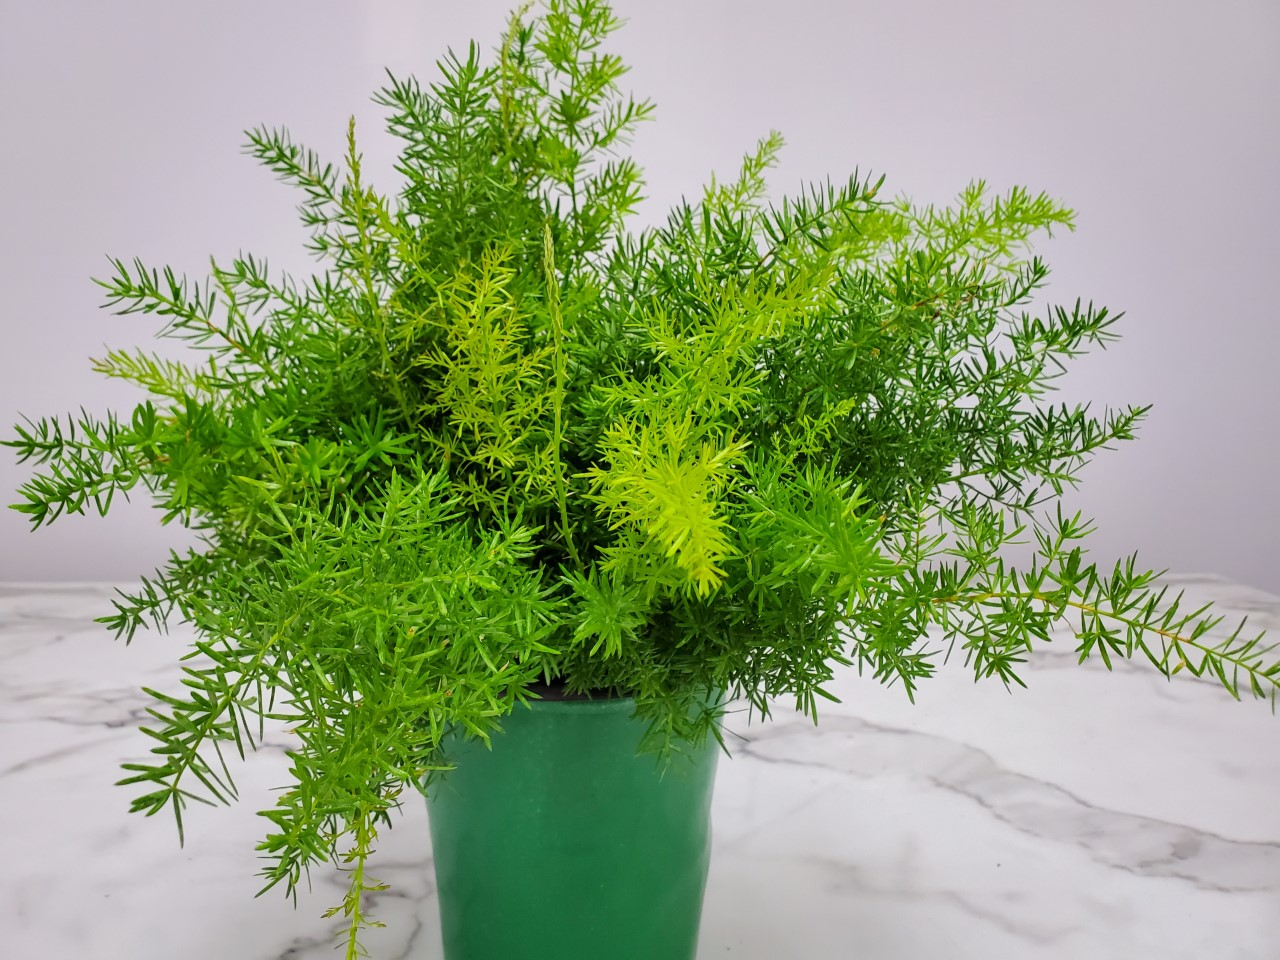 Sprengeri Asparagus Fern 1 Gallon